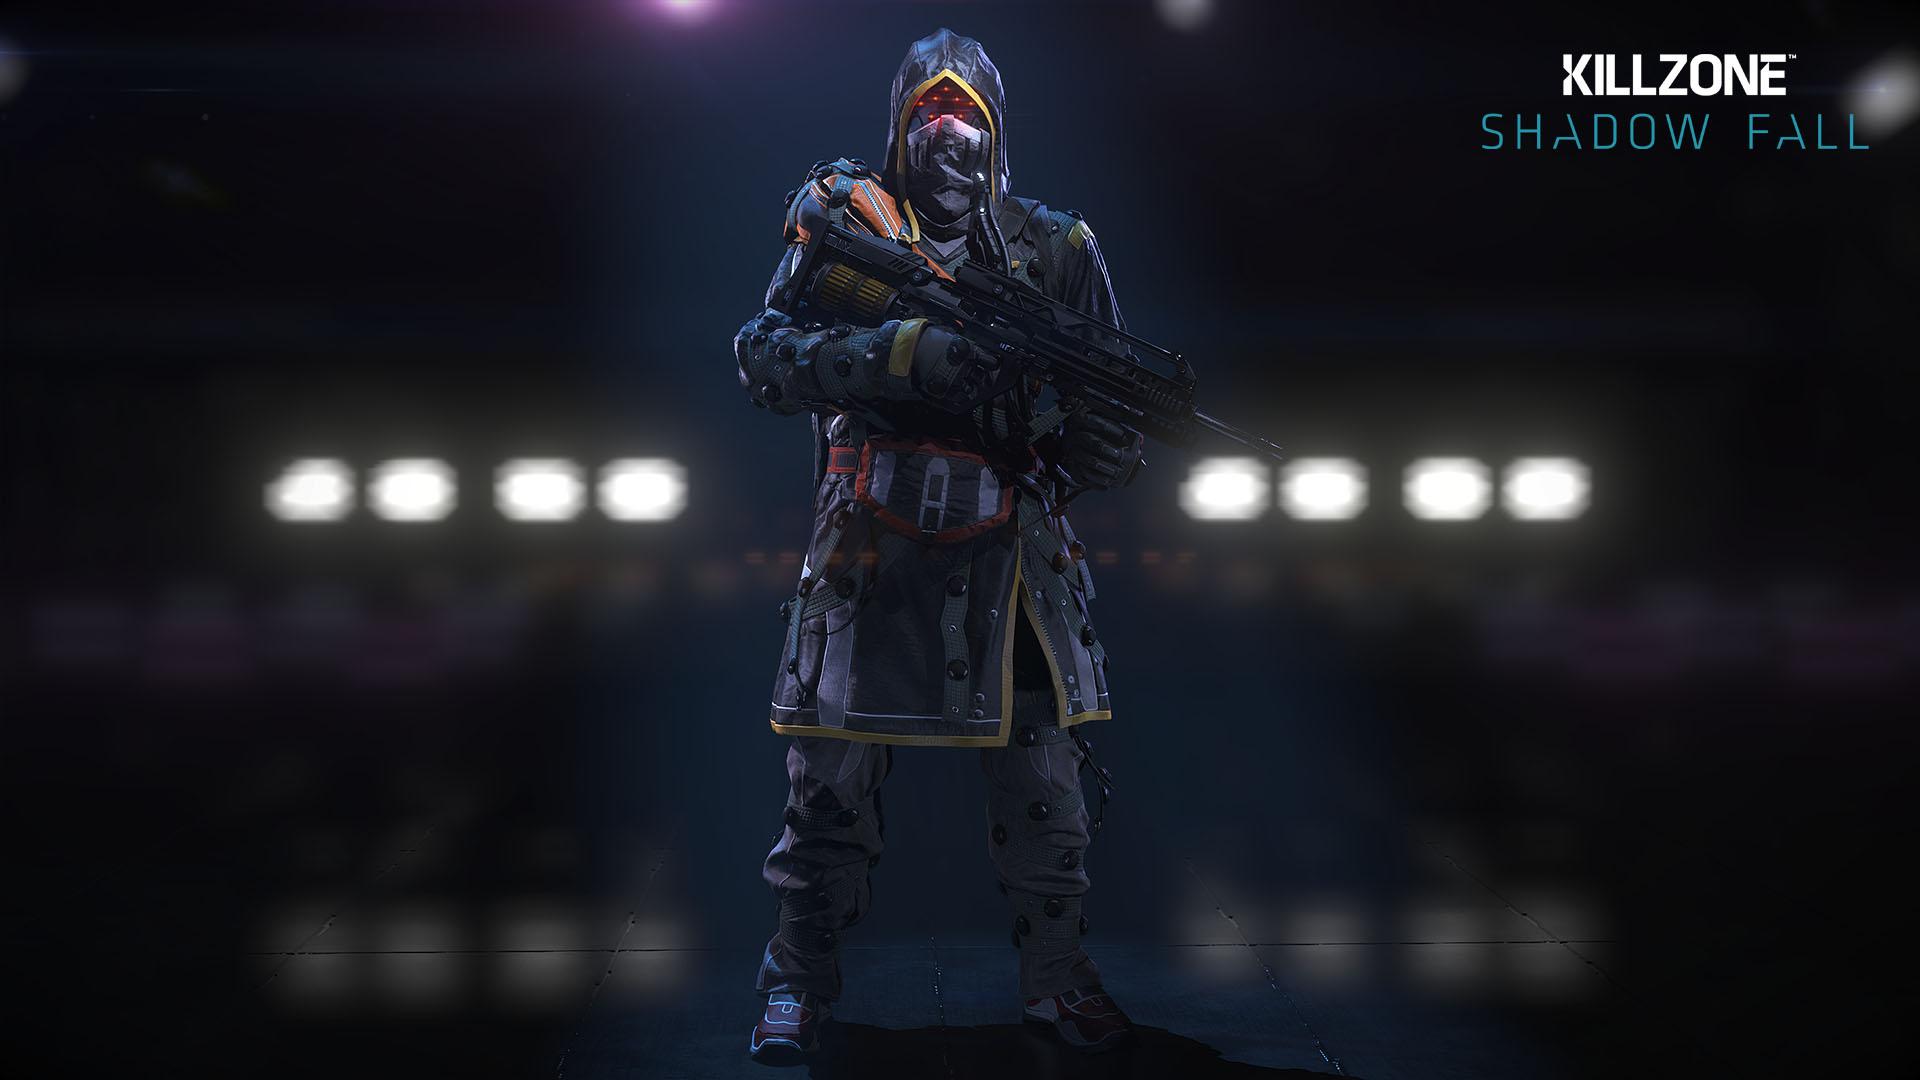 Killzone-ShadowFall PS4 Visuel 004